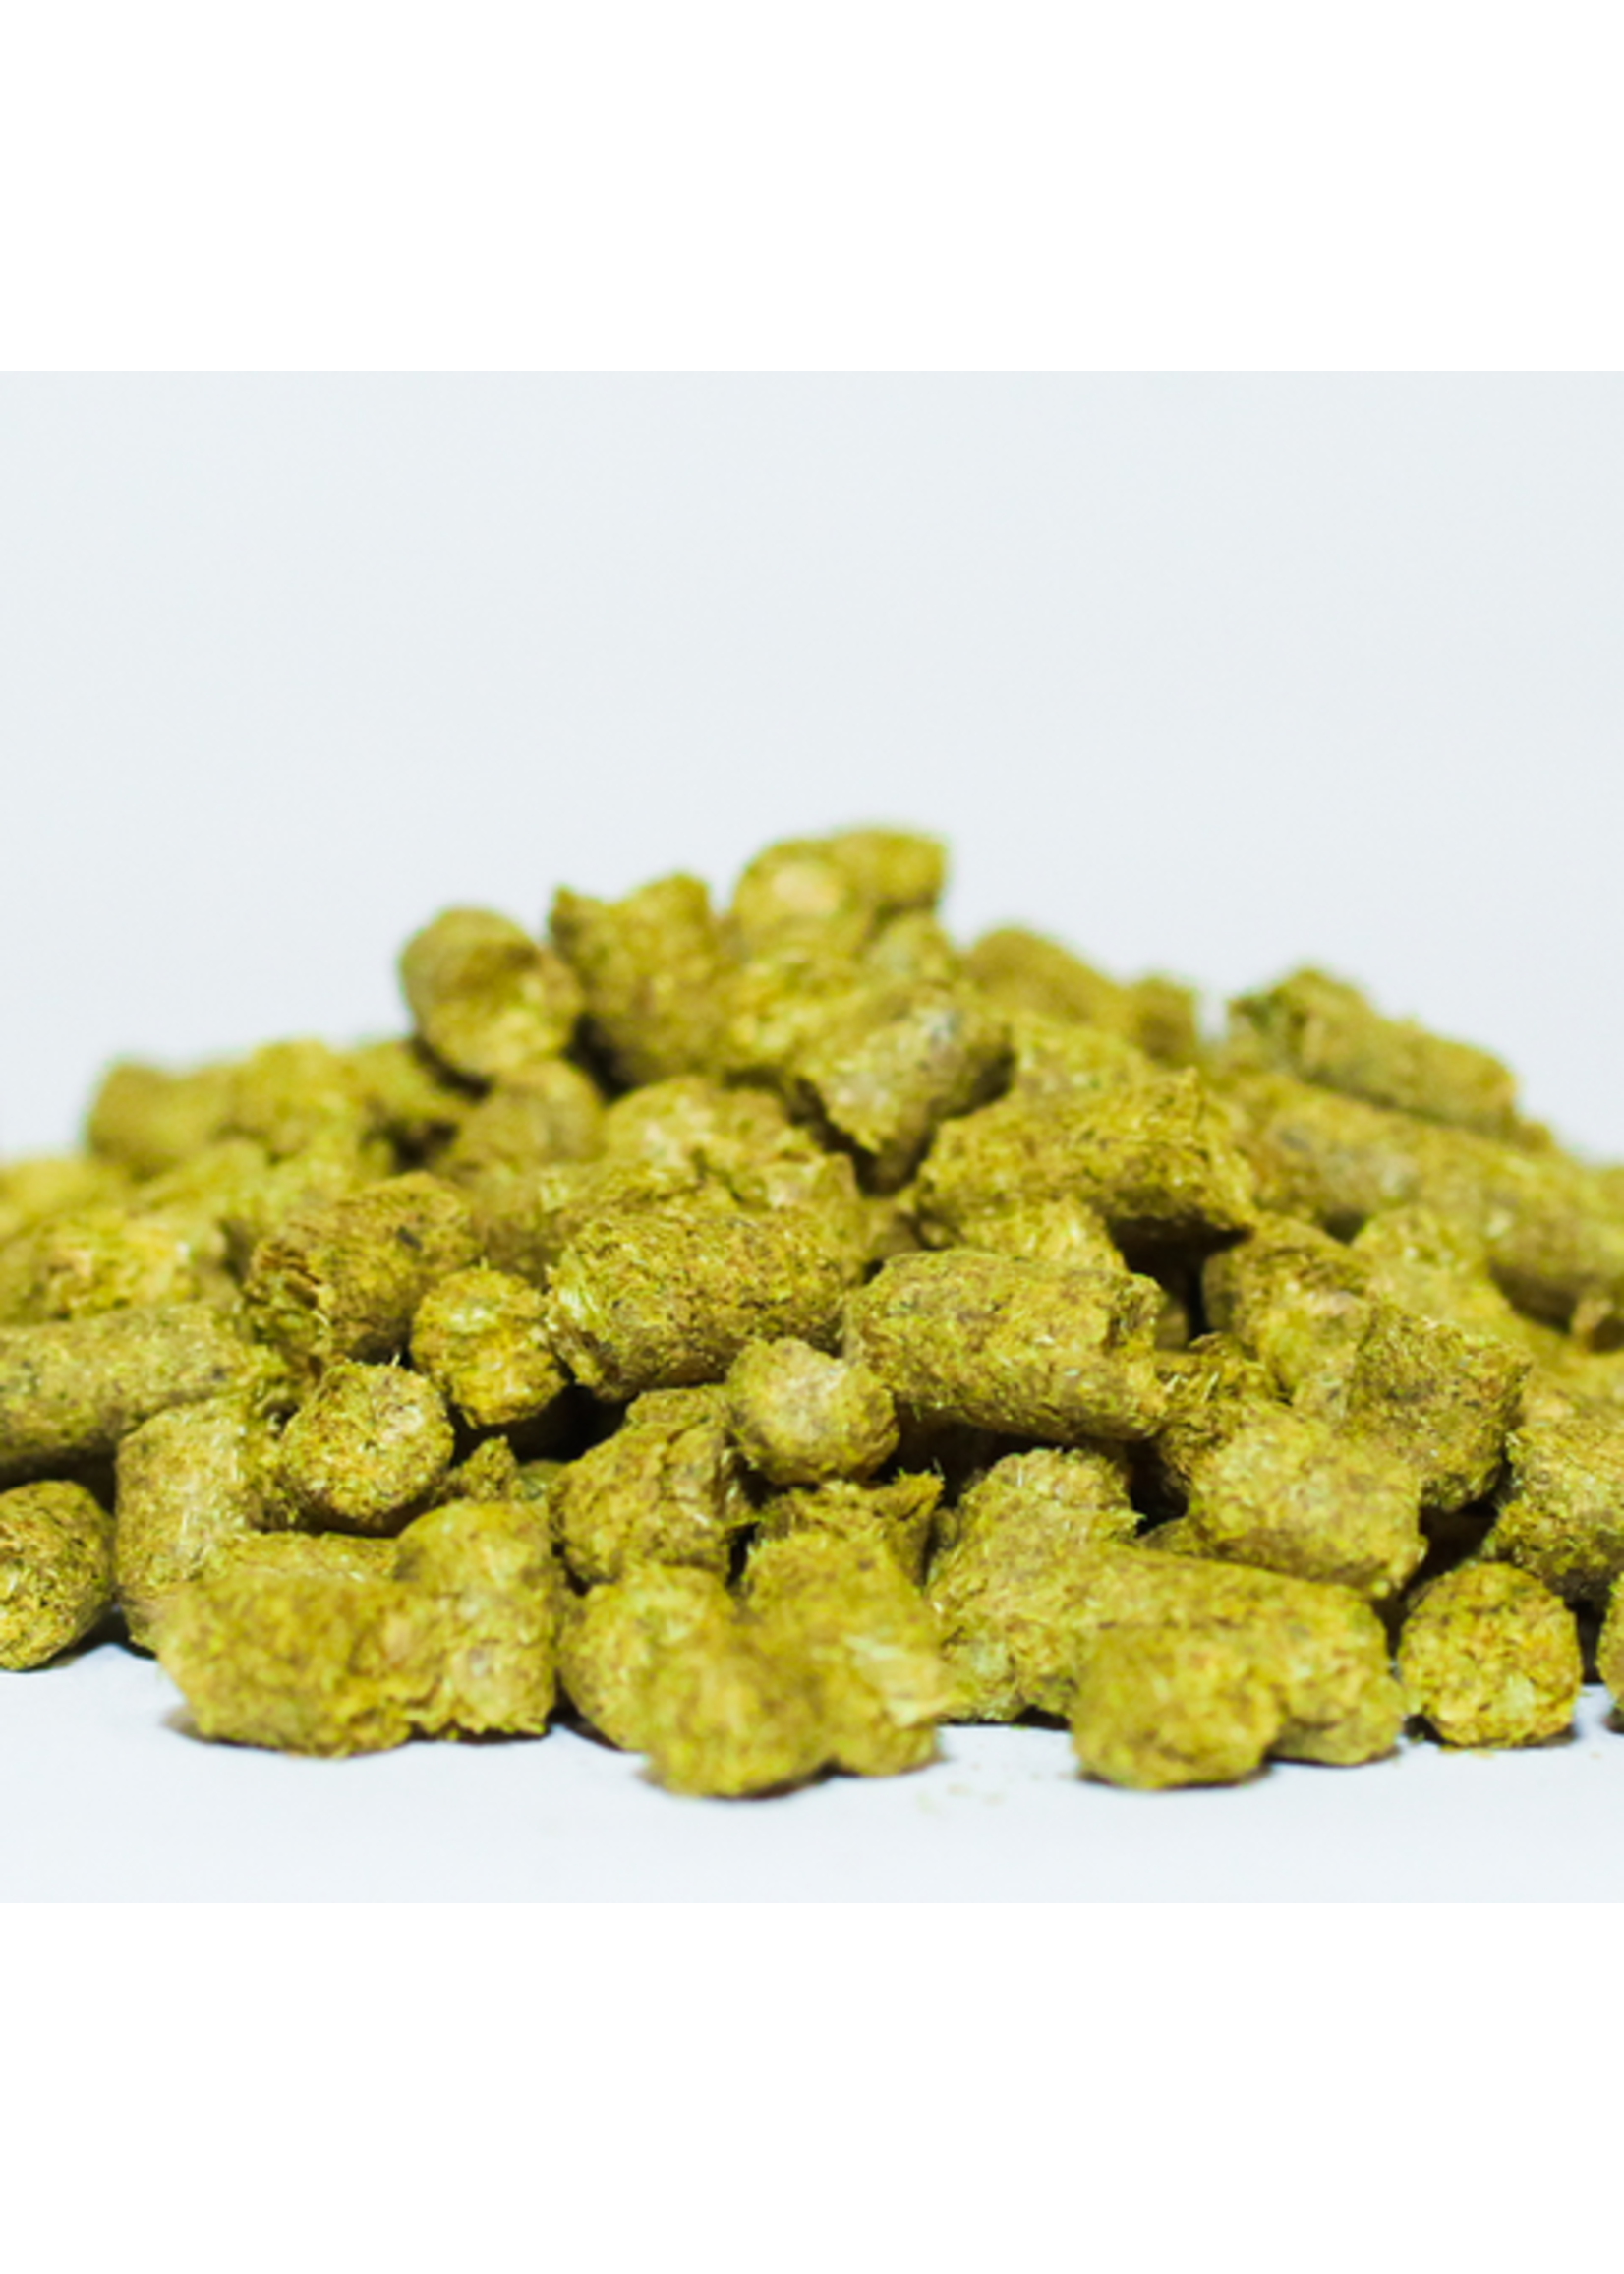 Hops Idaho Gem Hops (US) - Pellets - 1 oz